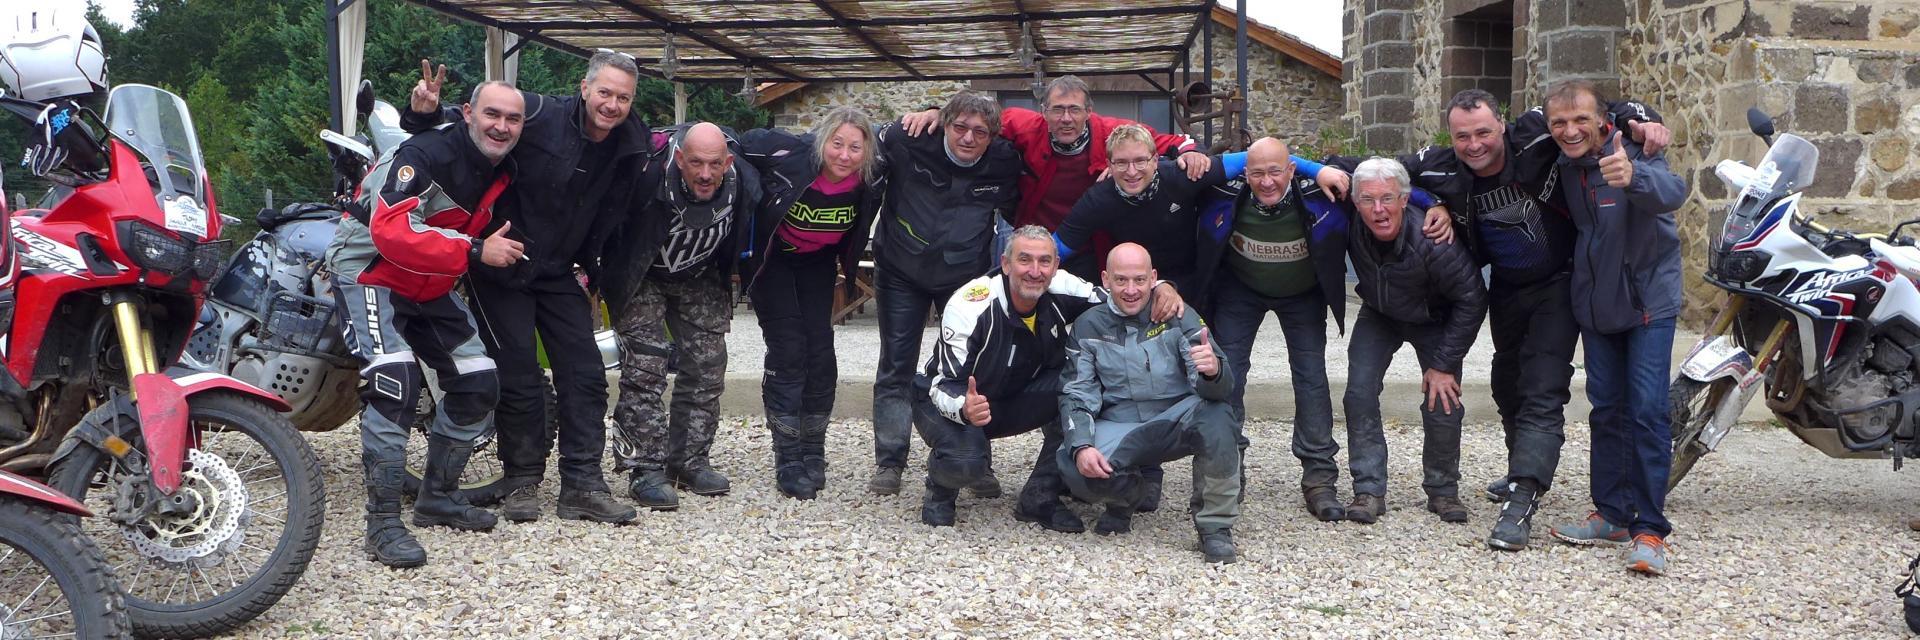 Groupe 1